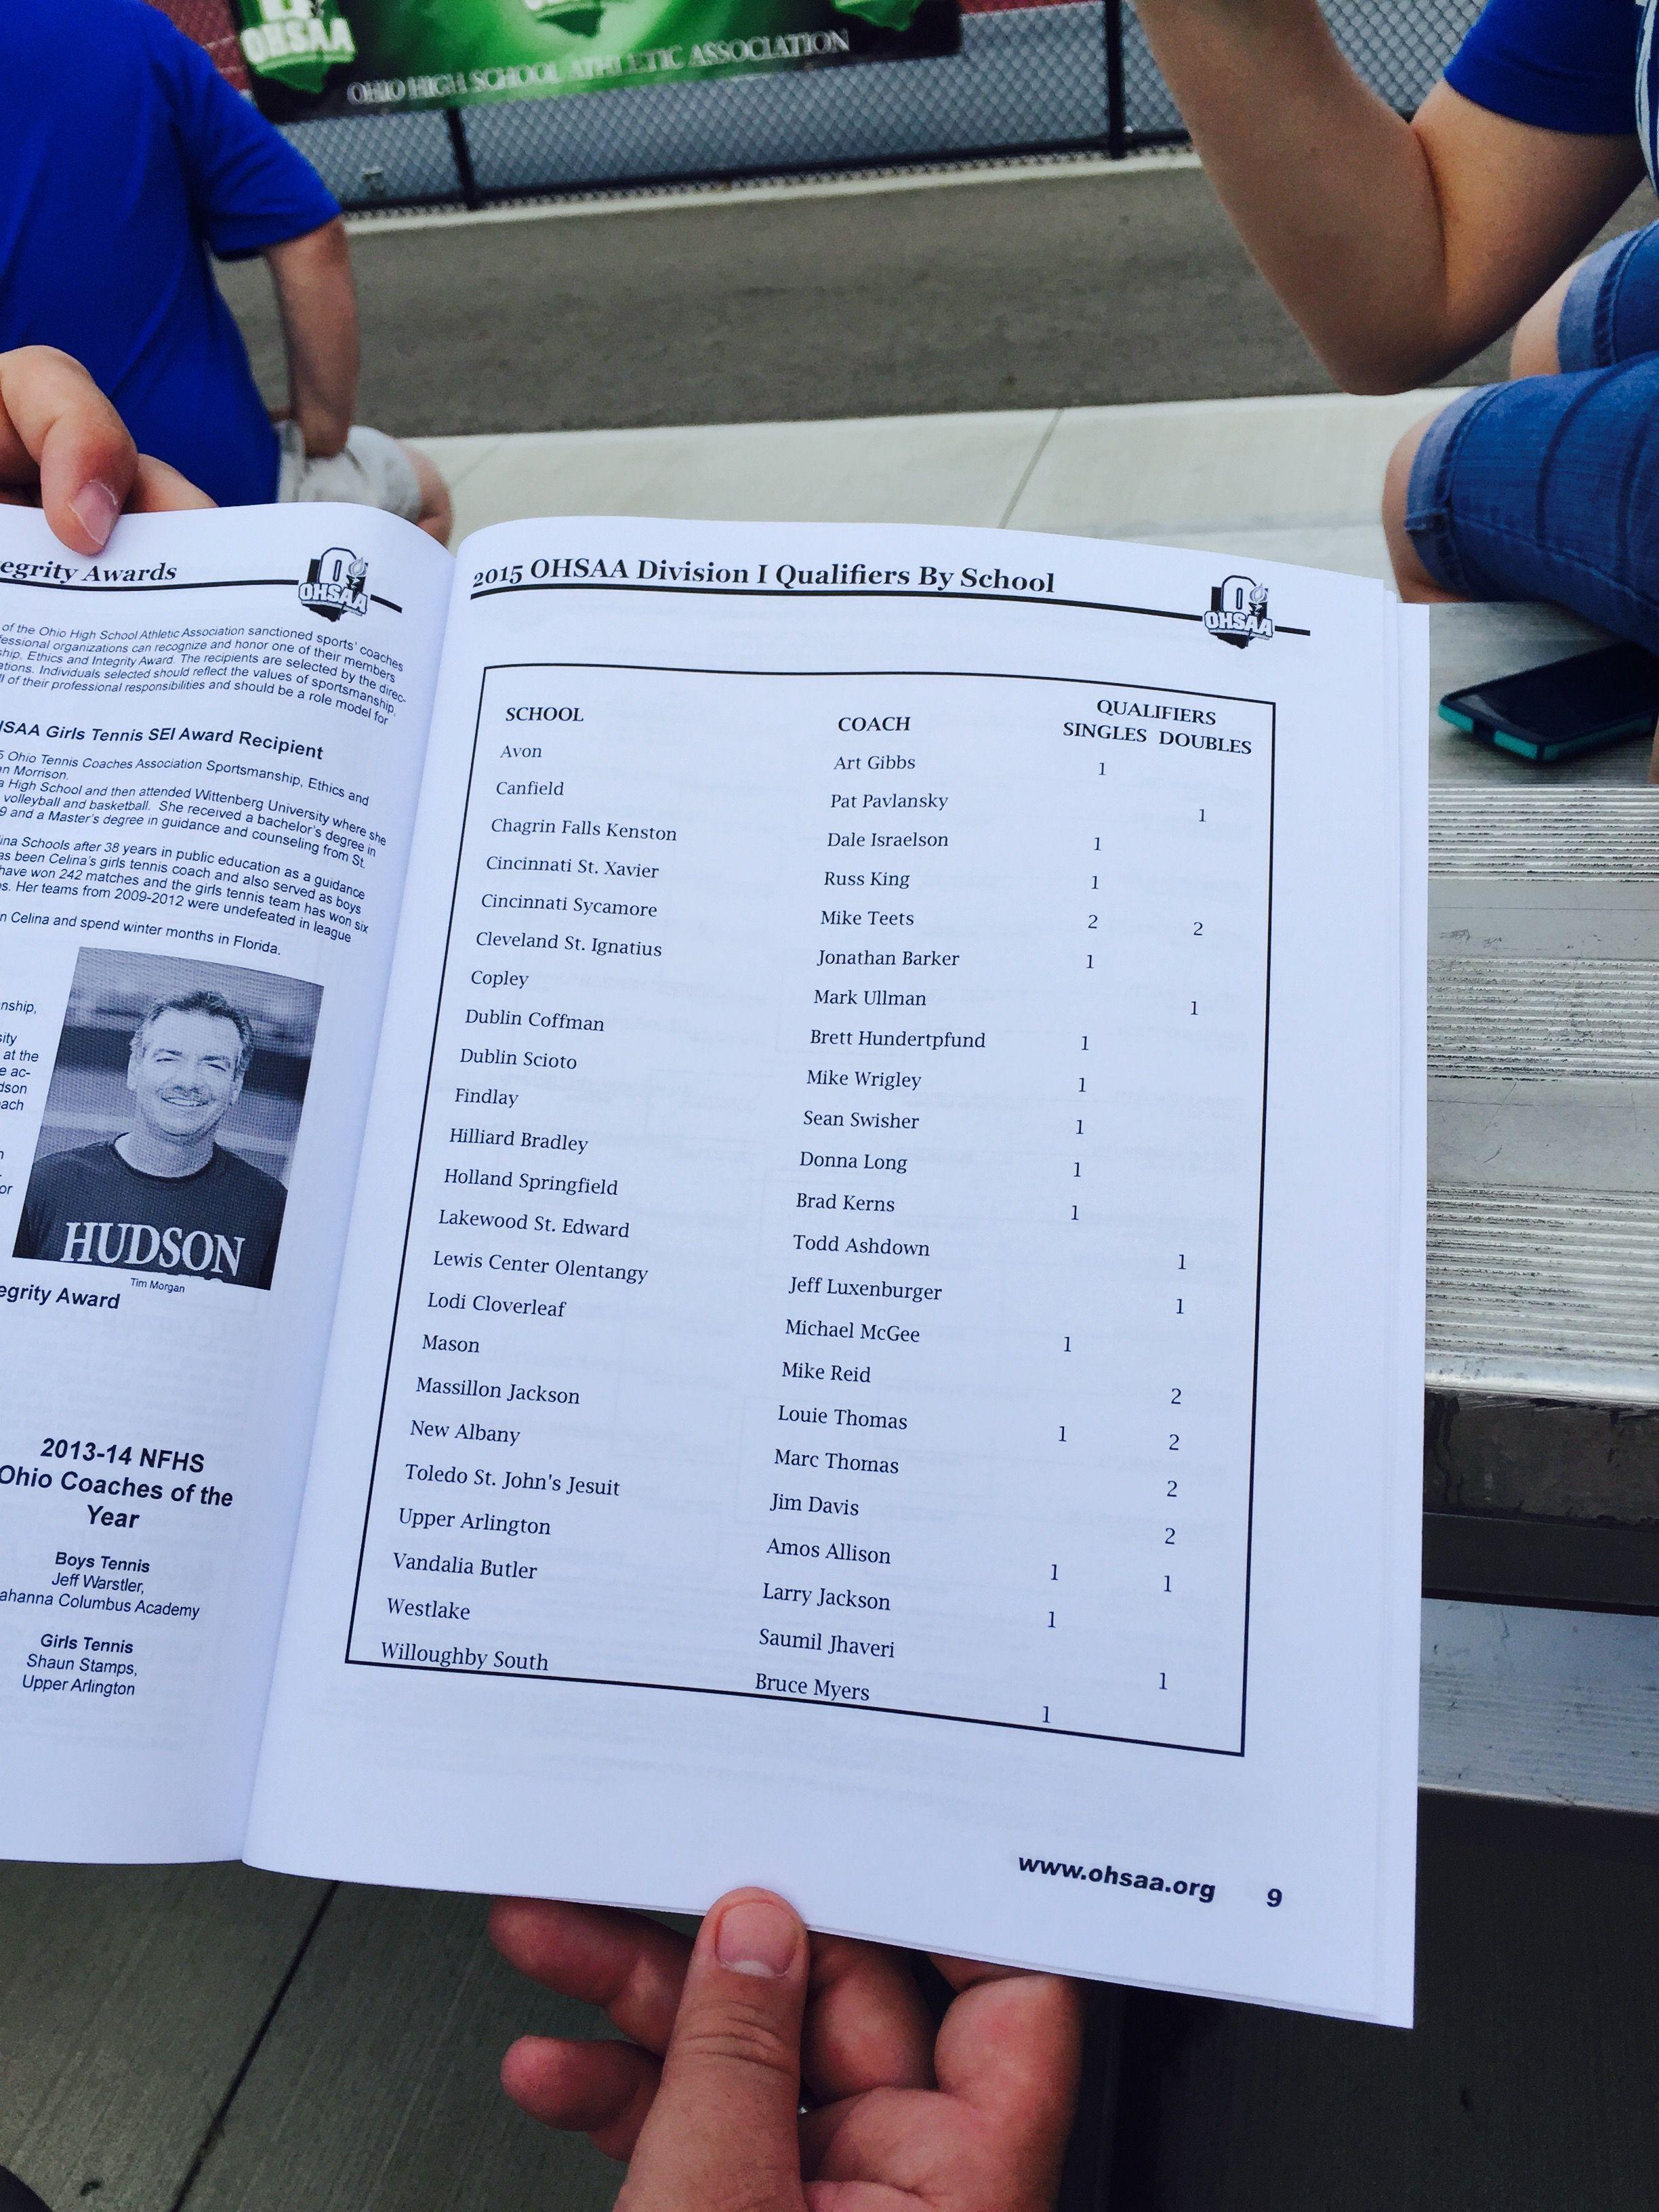 Pin By Frank Kohlhofer On Springfield Athletics School Coach School Coaching